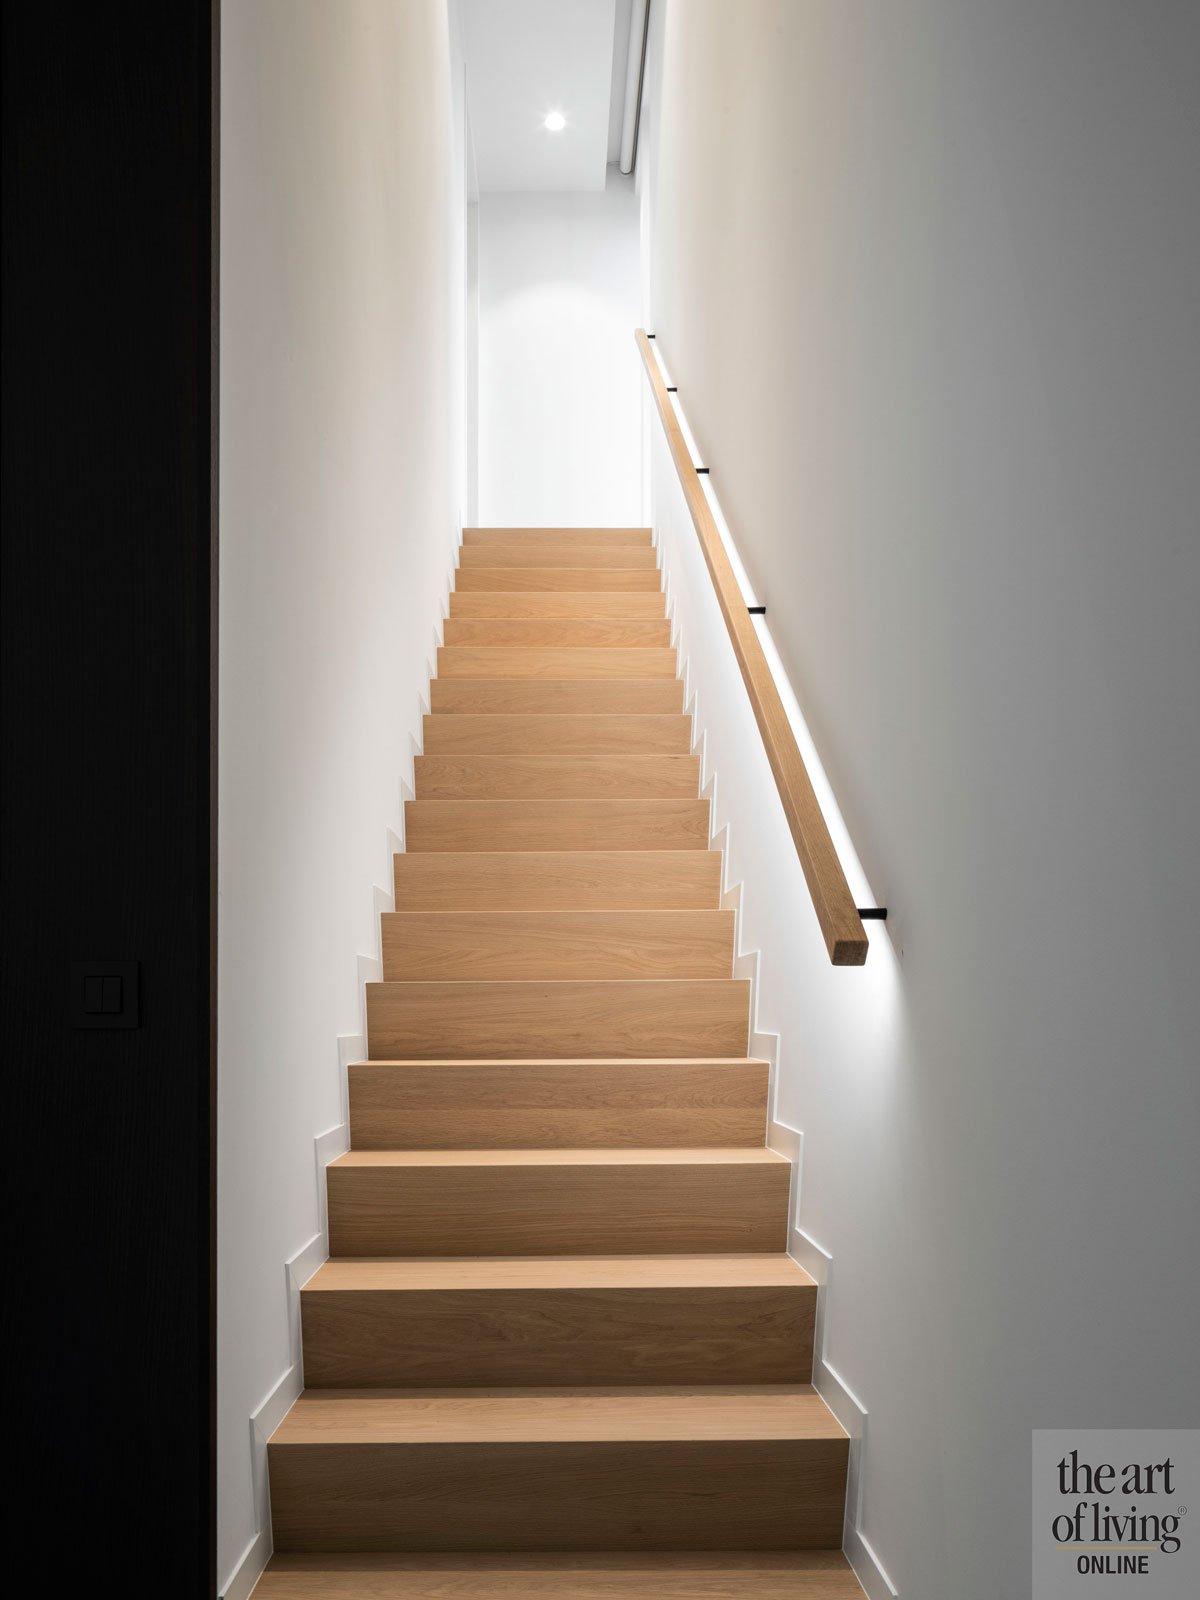 Moderne architectuur, Claes Vanoppen, the art of living